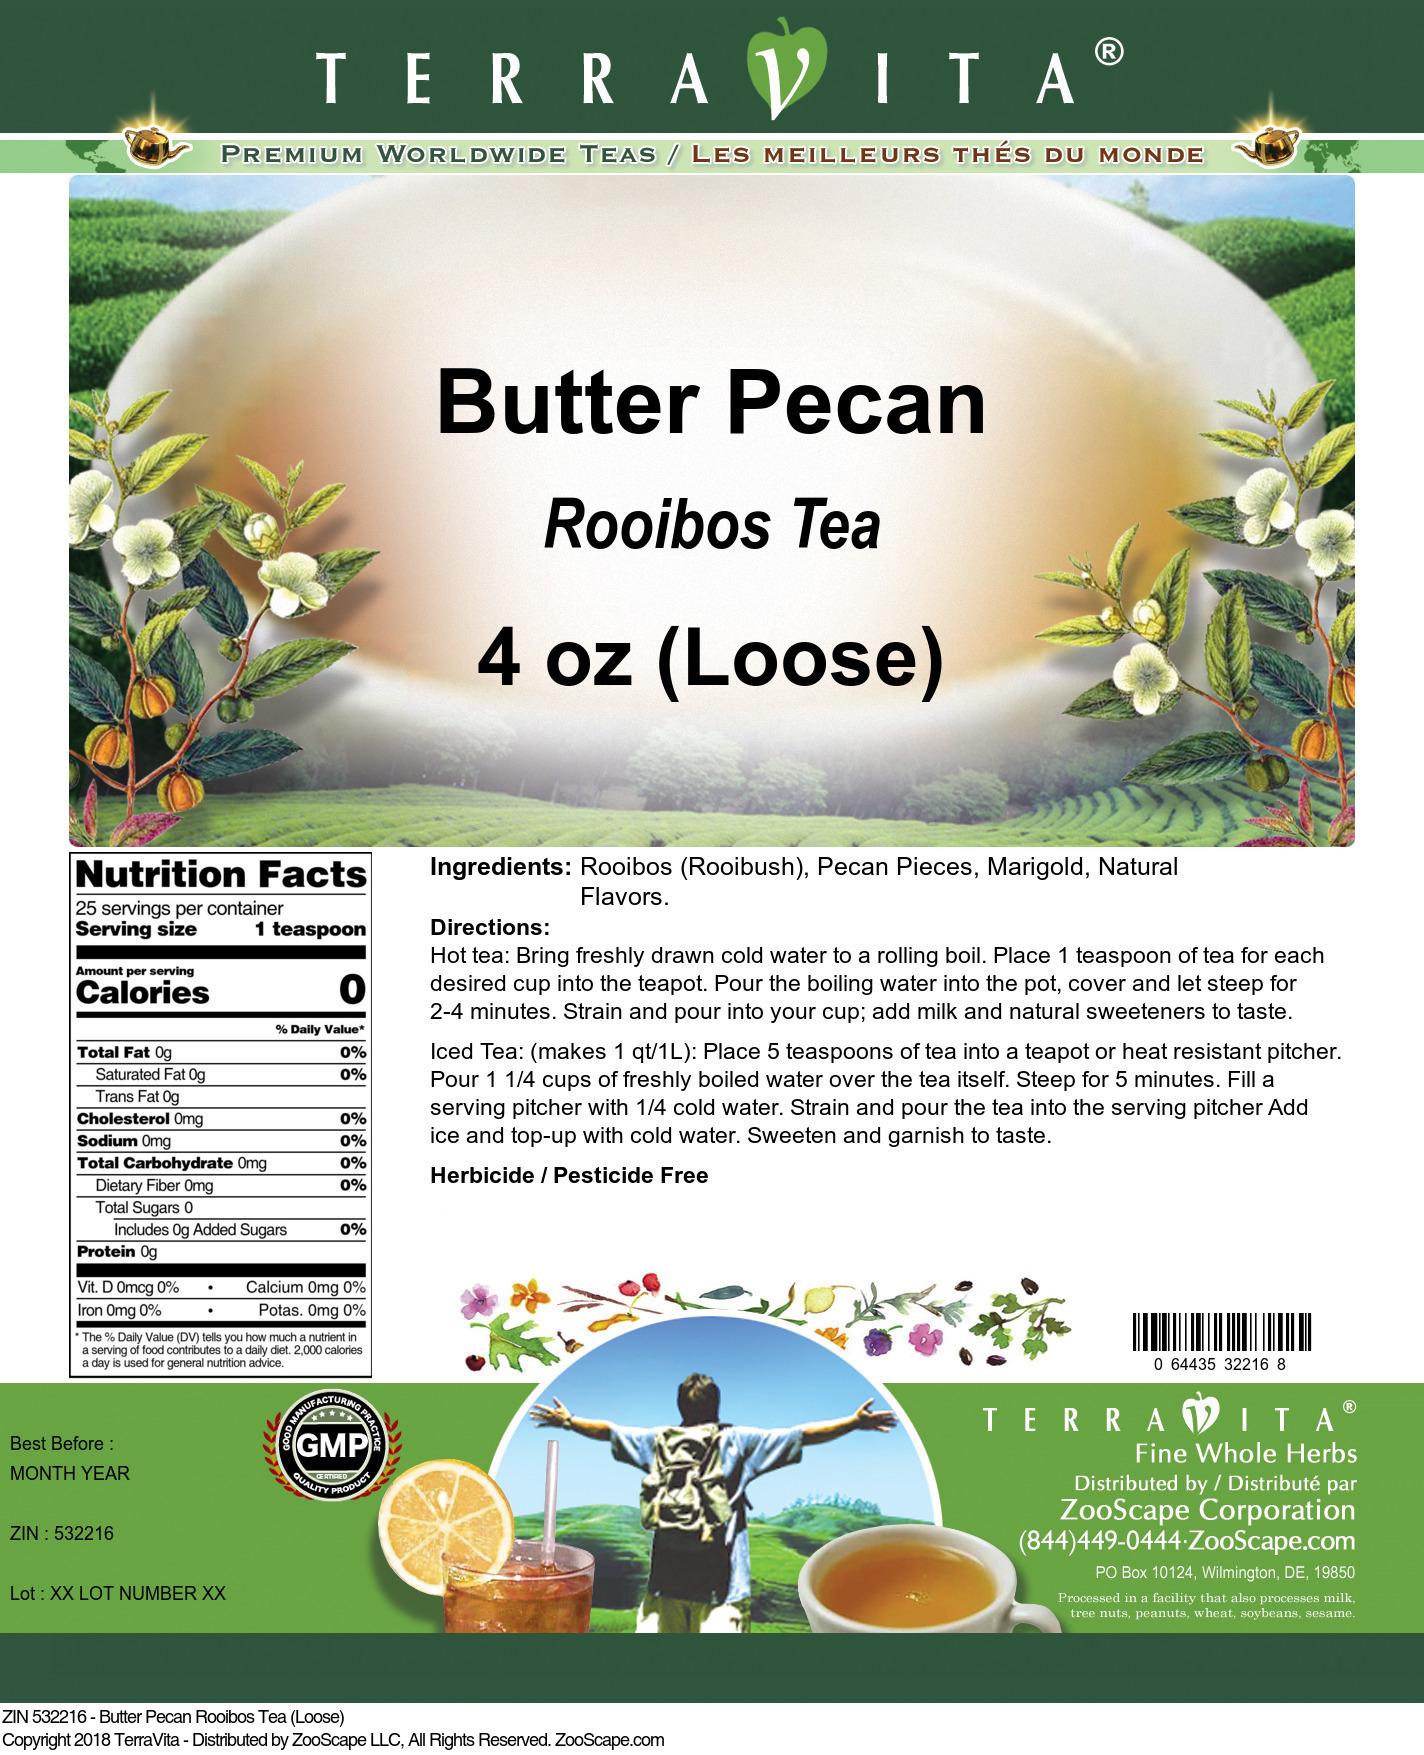 Butter Pecan Rooibos Tea